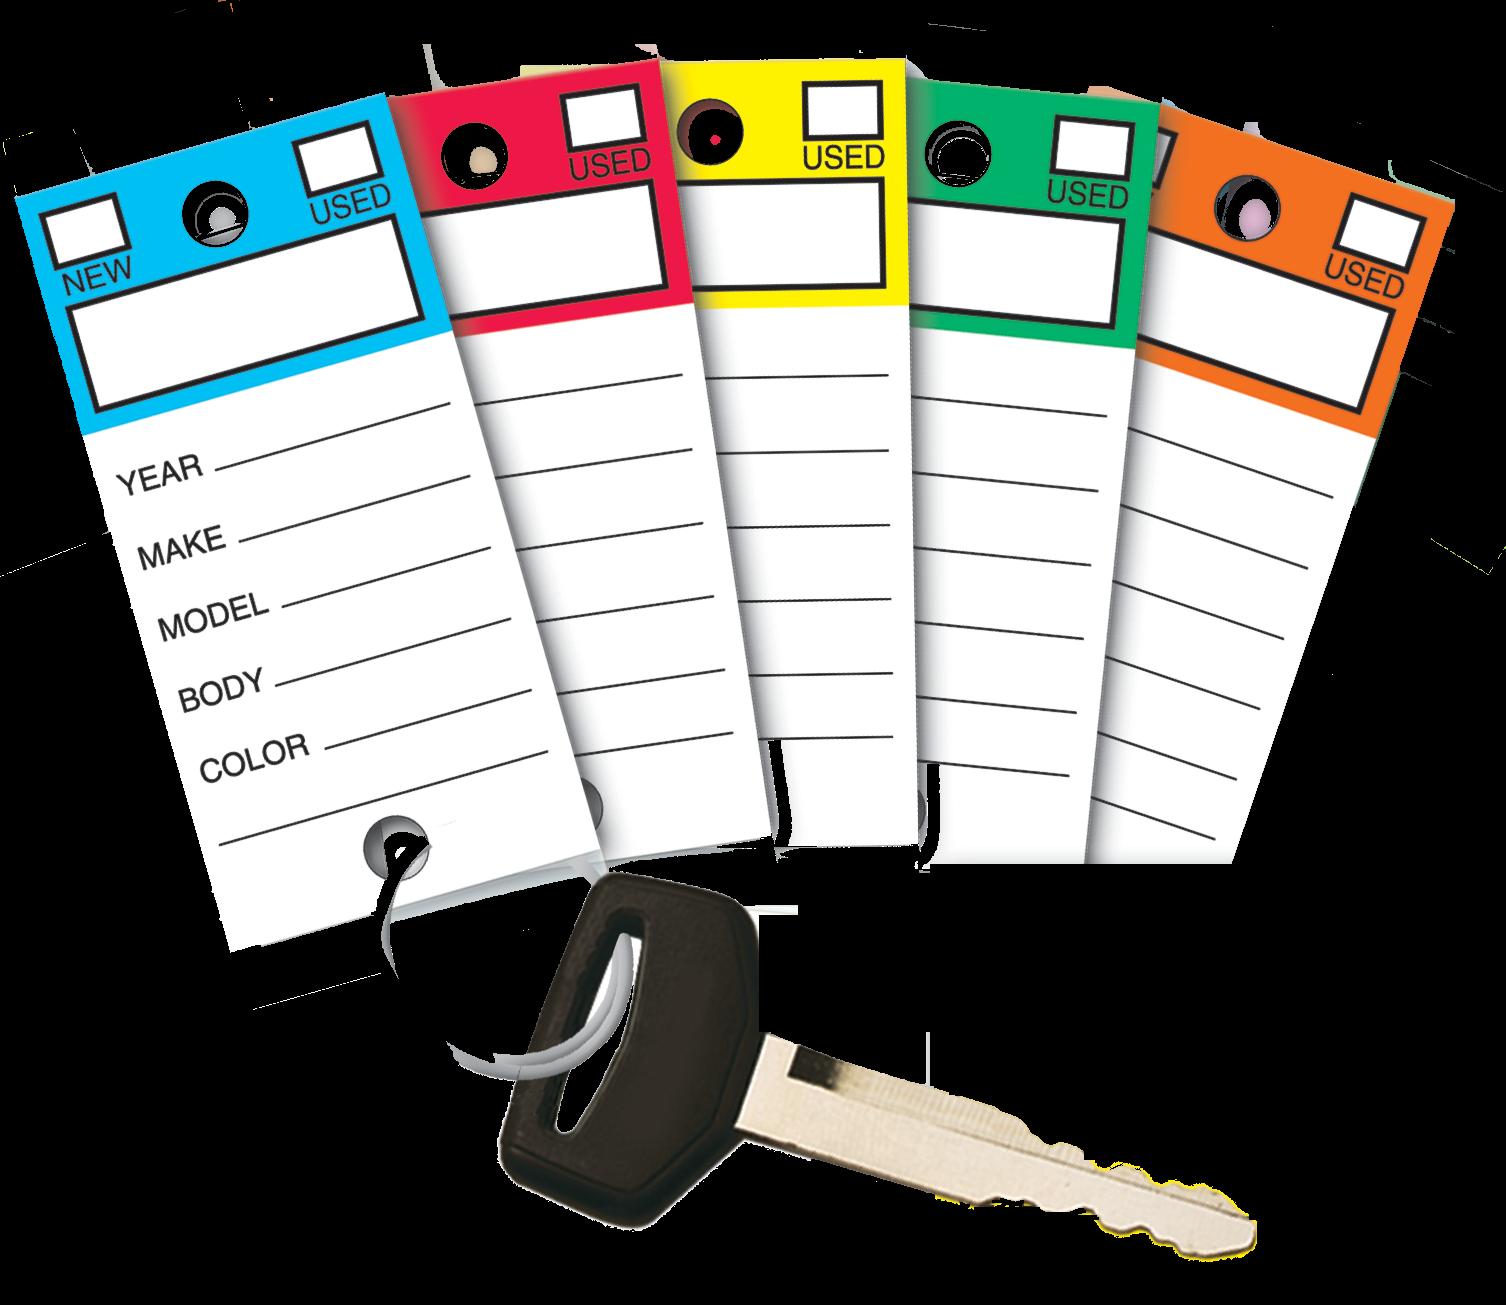 Clipart key colorful key. Self laminated fold n